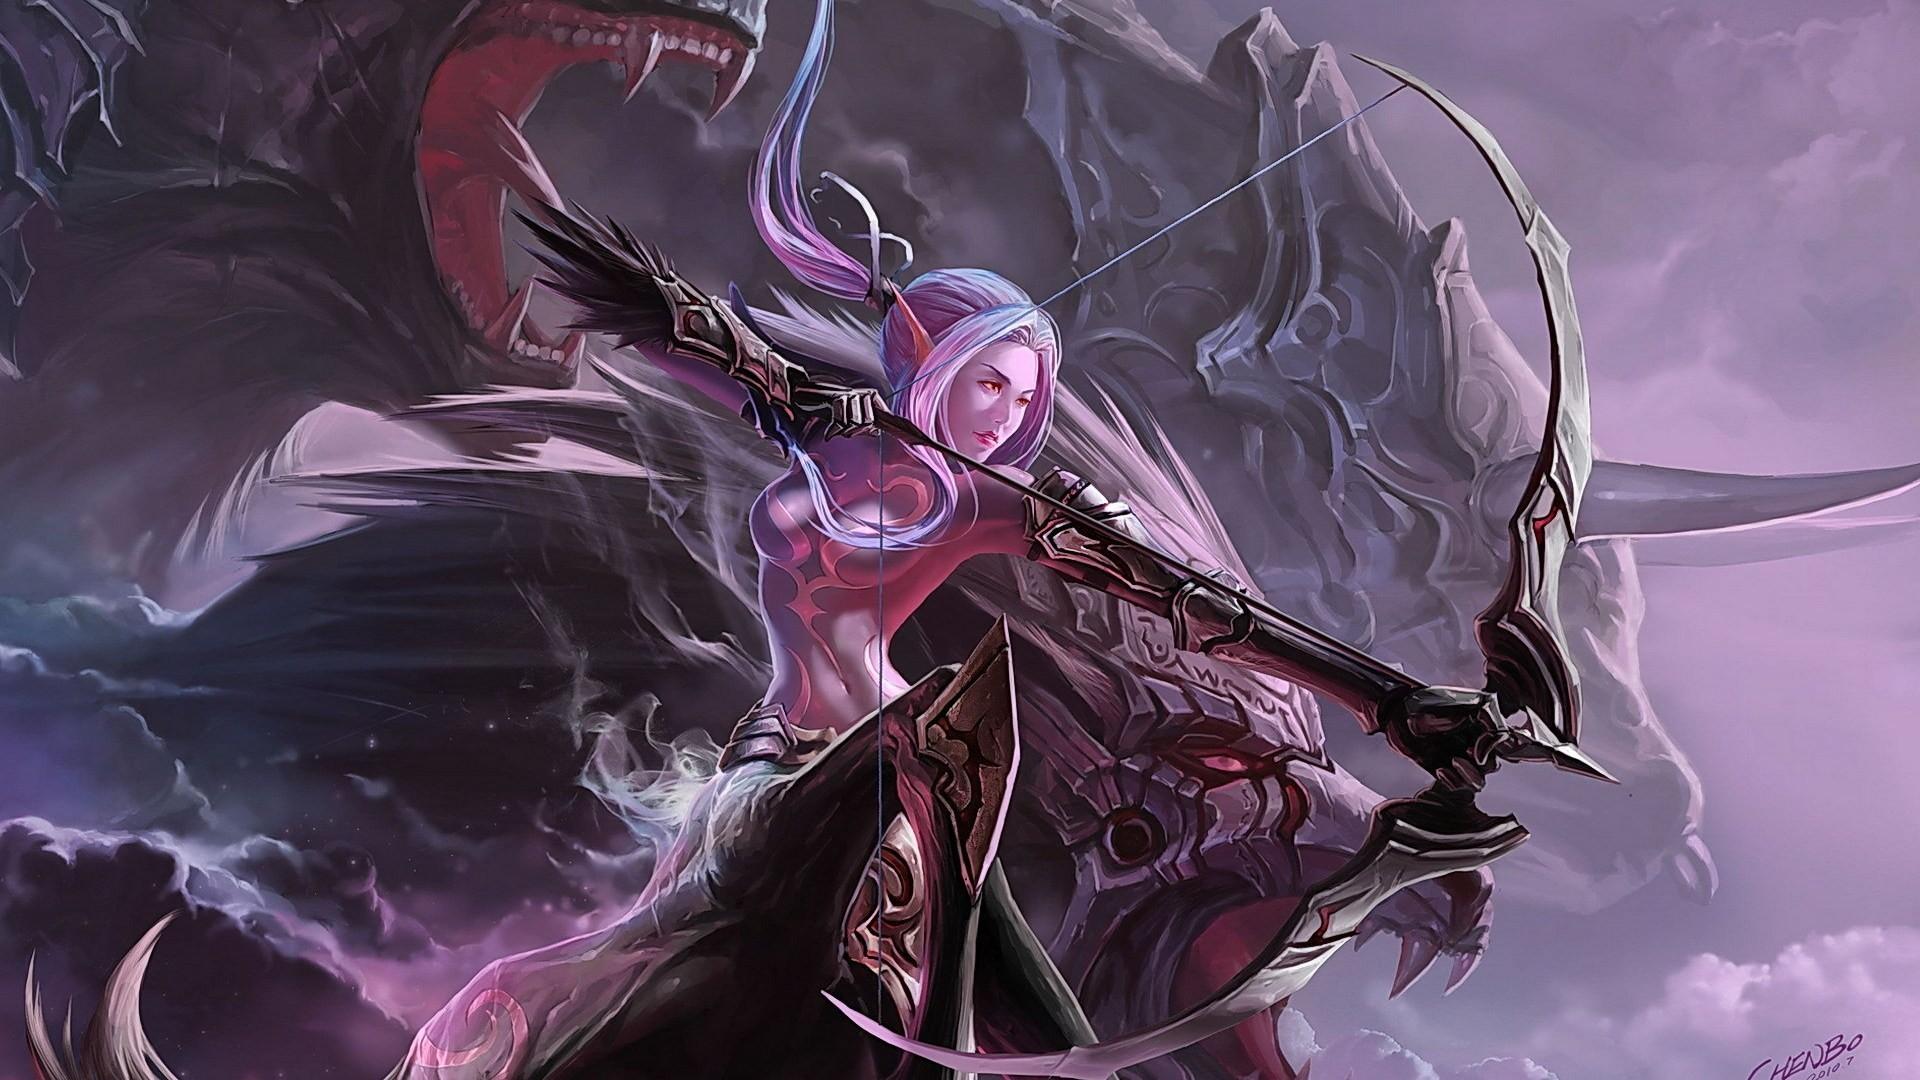 Archer Warrior Elves Fantasy Art Wallpapers Hd: WallpaperSafari